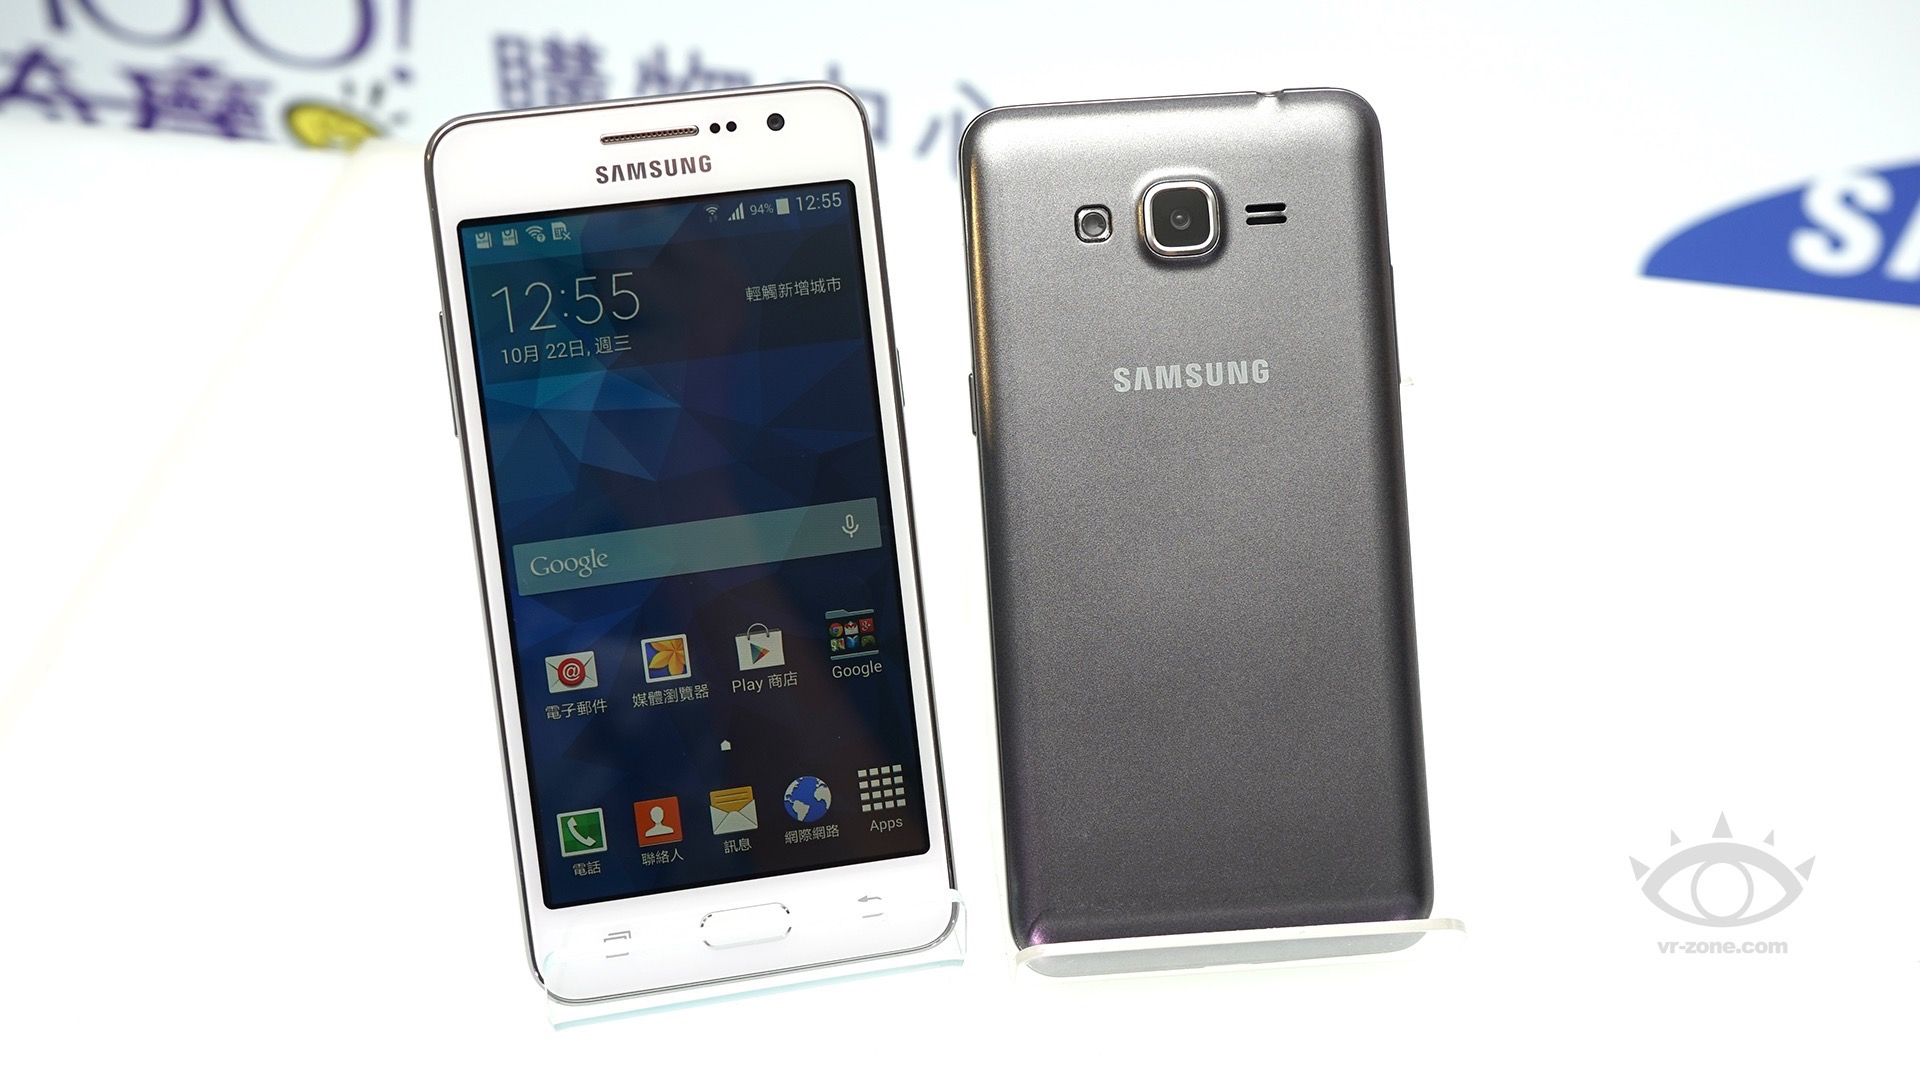 Samsung-GALAXY-GRAND-Prime-與-GALAXY-CORE-Prime-2.jpg